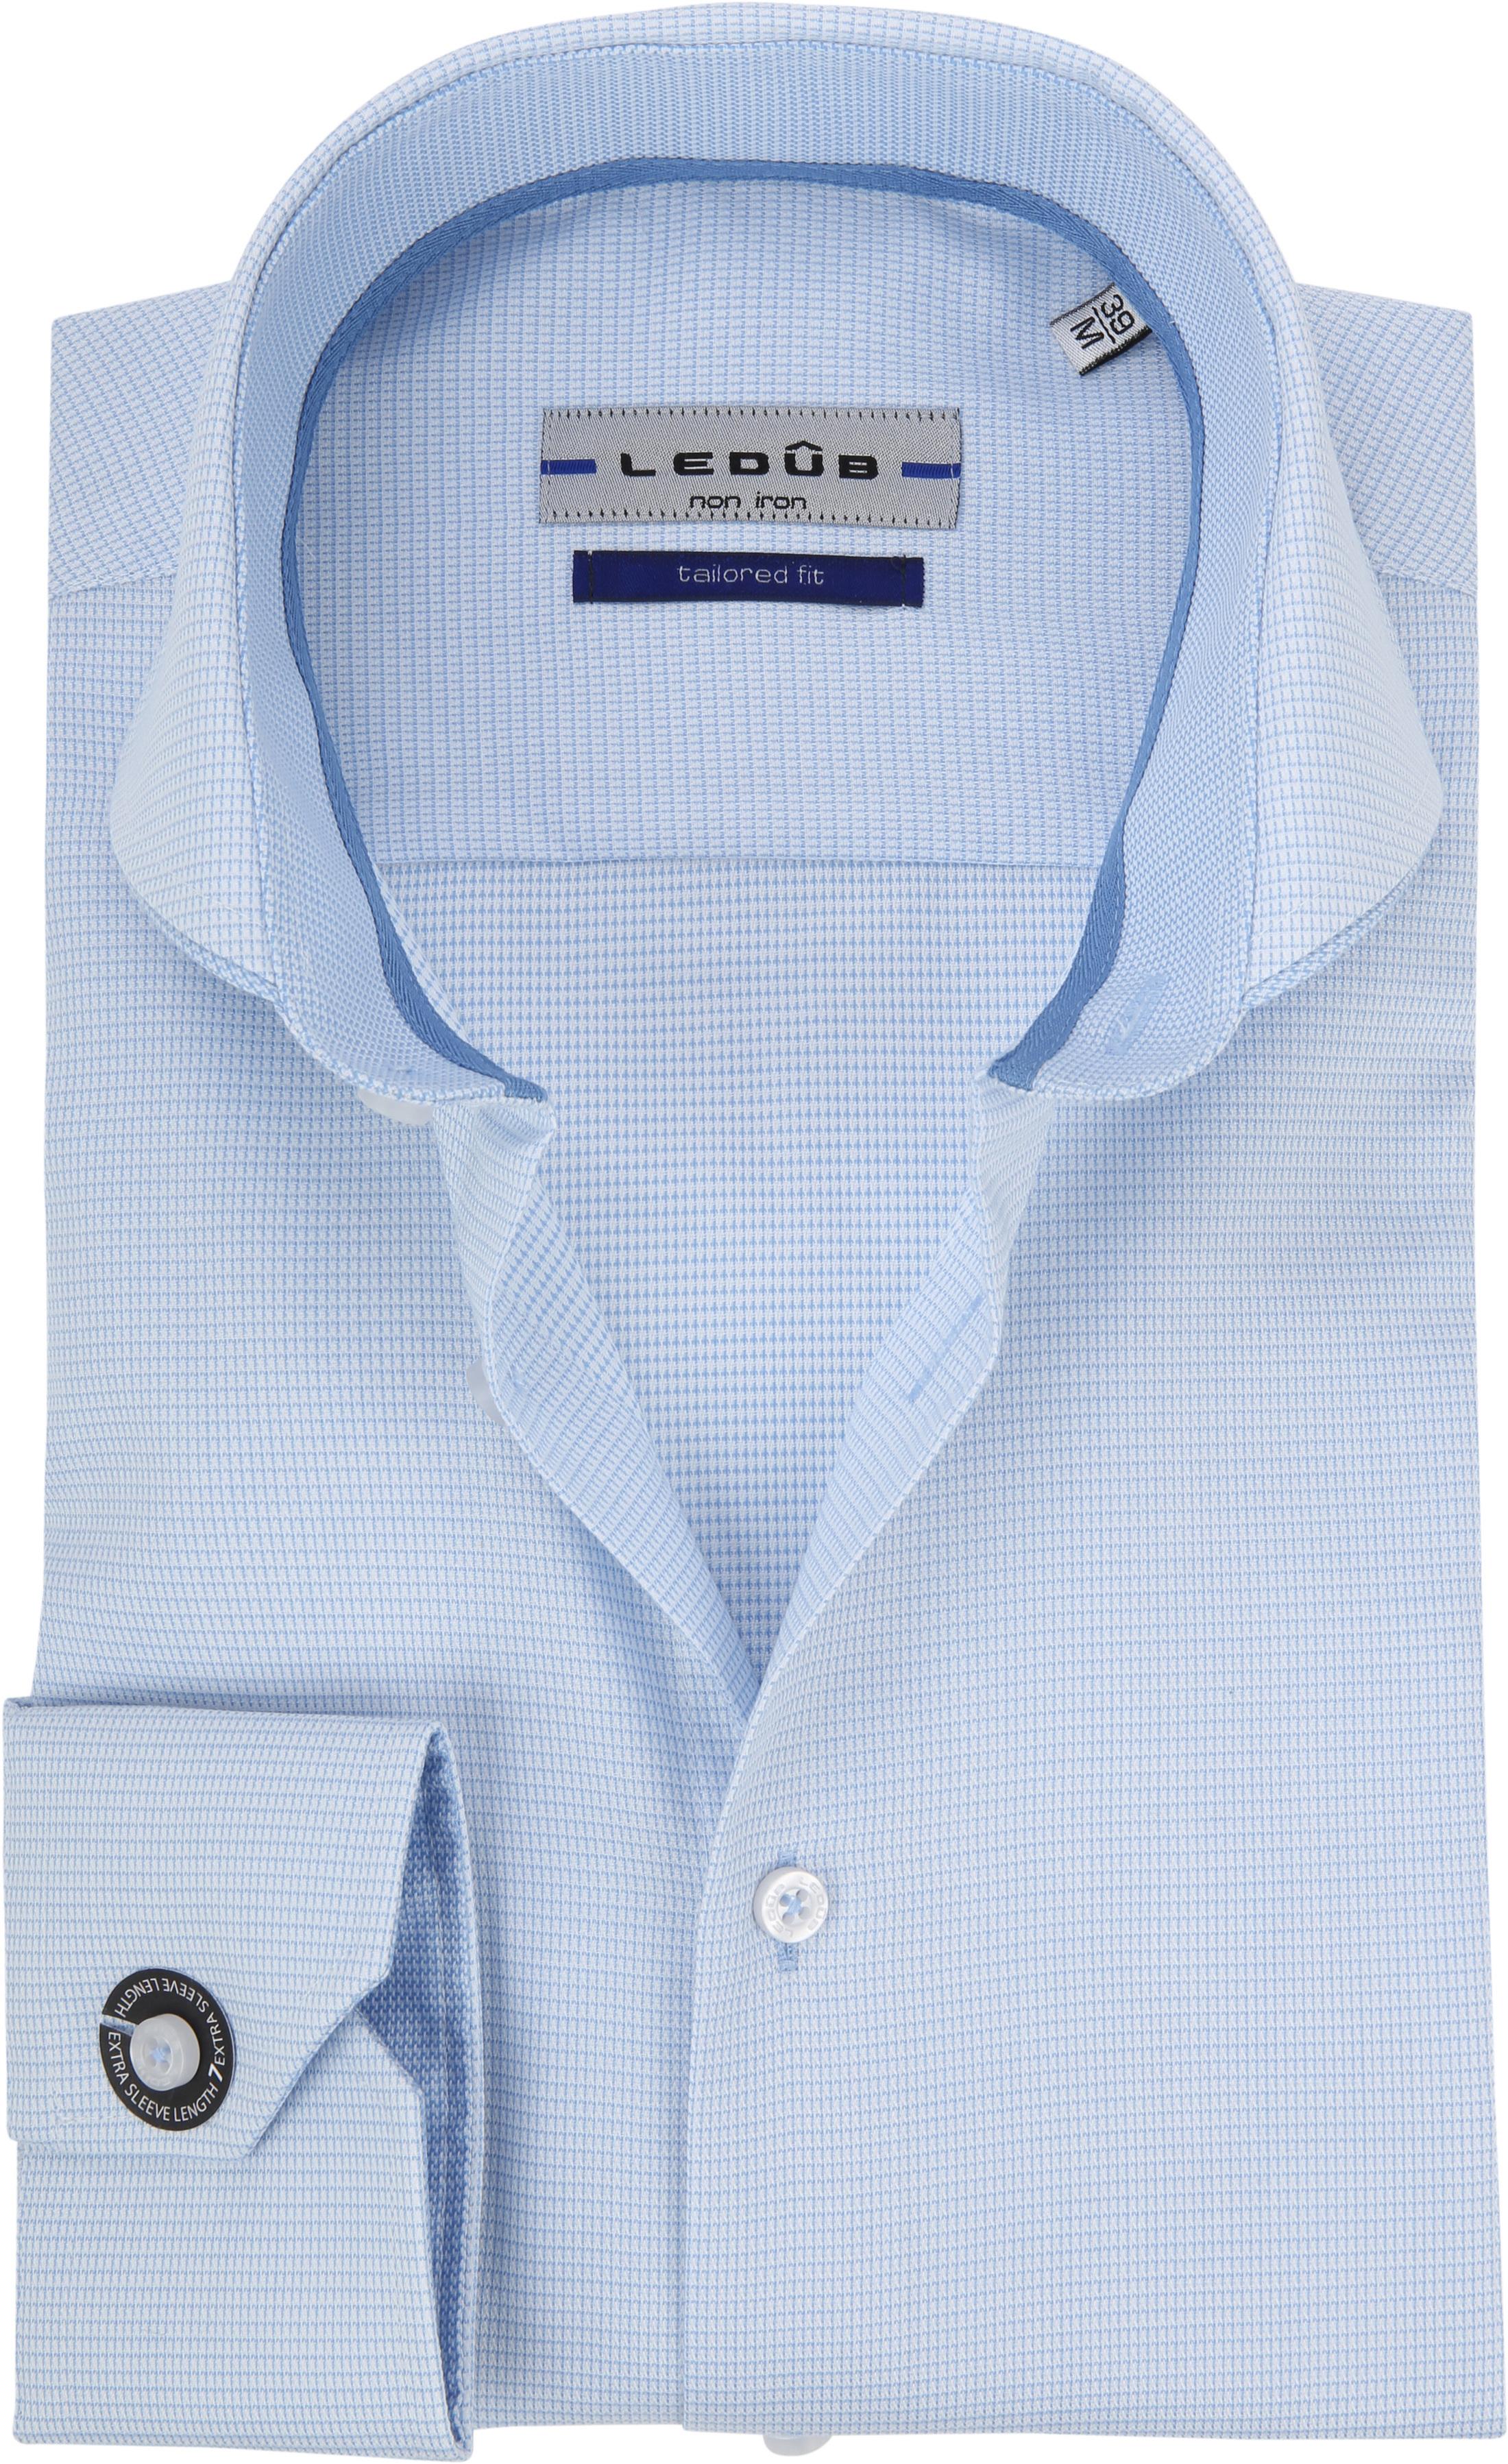 Ledub Overhemd Blauw Non Iron SL7 foto 0